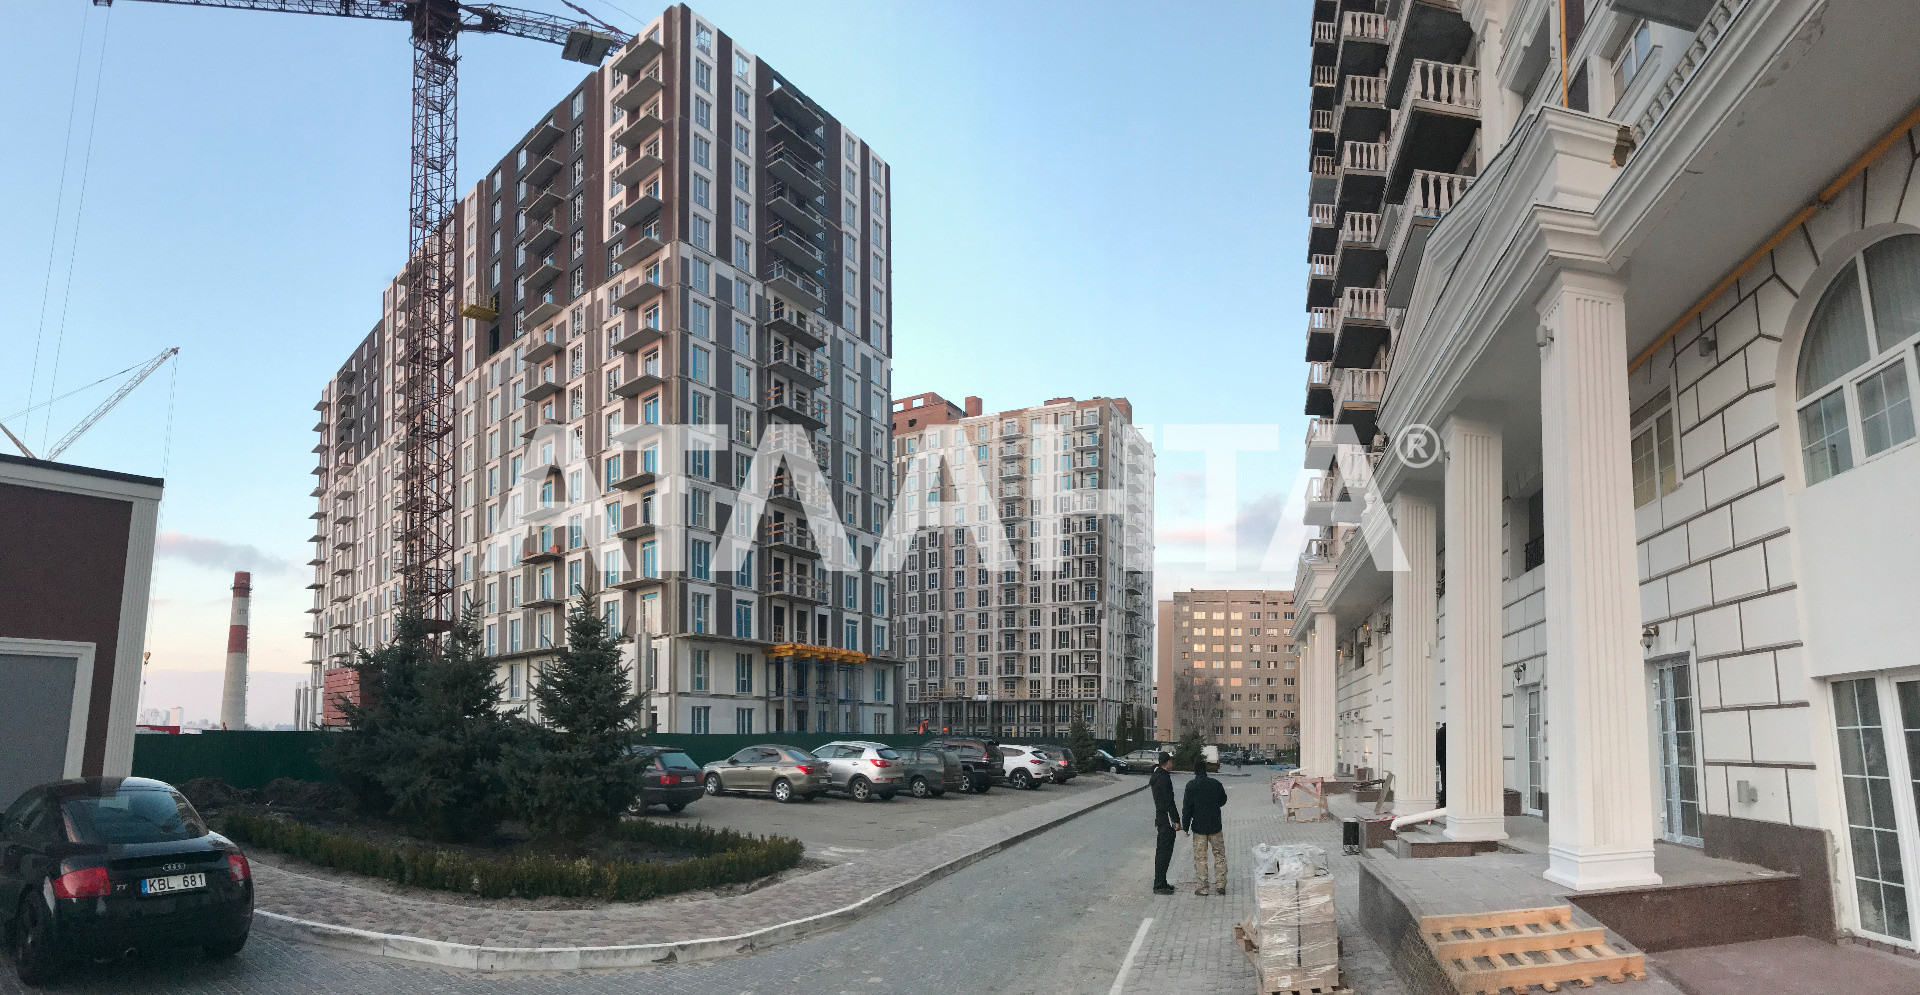 Продается 1-комнатная Квартира на ул. Ул. Максимовича (Онуфрия Трутенко) — 38 000 у.е.